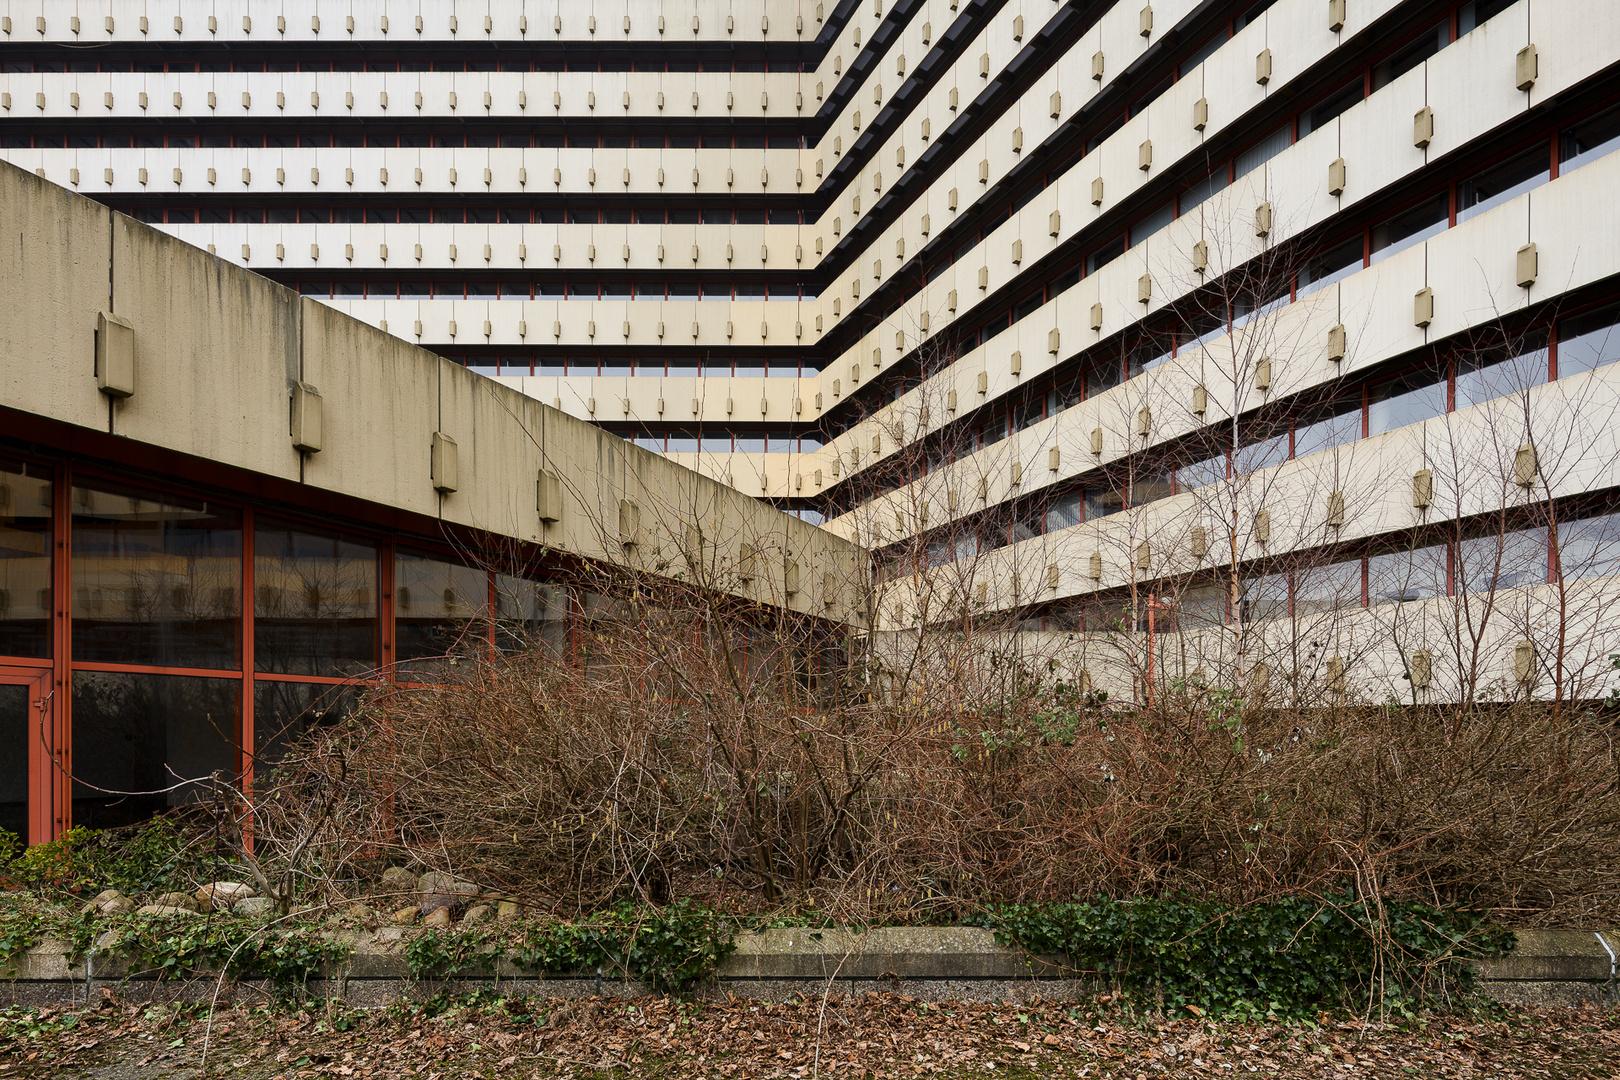 Post pyramide foto bild architektur lost places for Architektur brutalismus